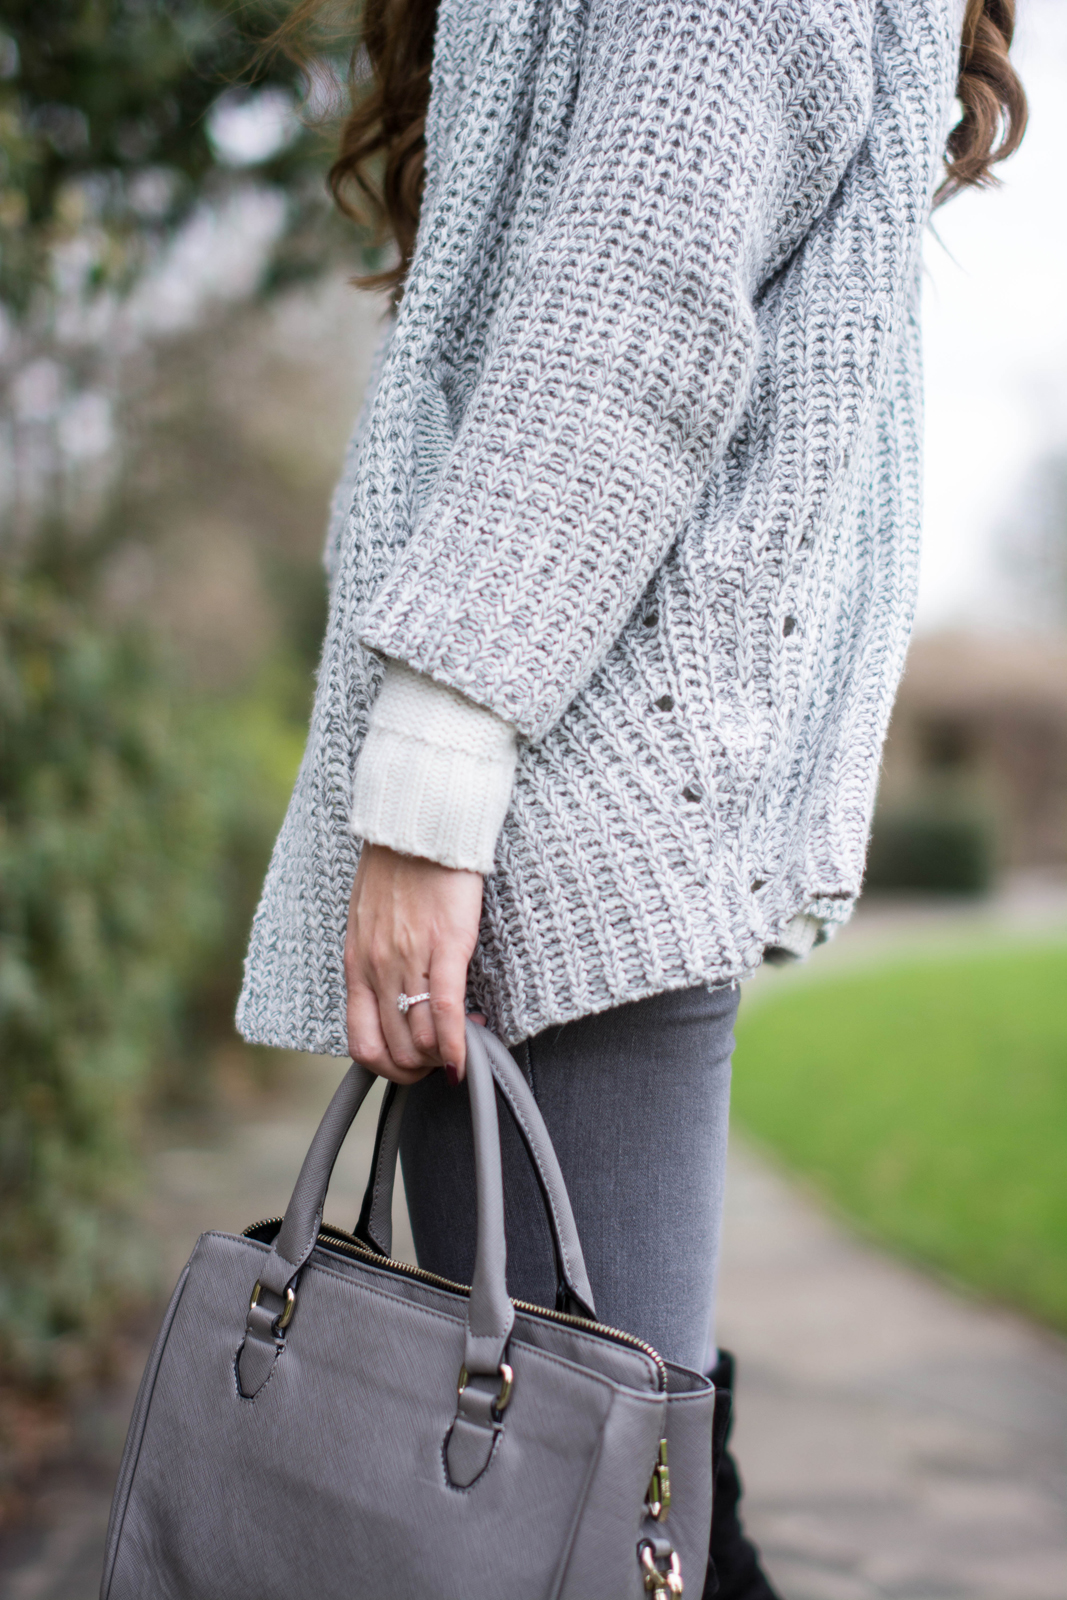 EJSTYLE - Lookbook store cardigan knit, forever 21 cream sweater jumper, grey skinny jeans, grey zara mini city bag